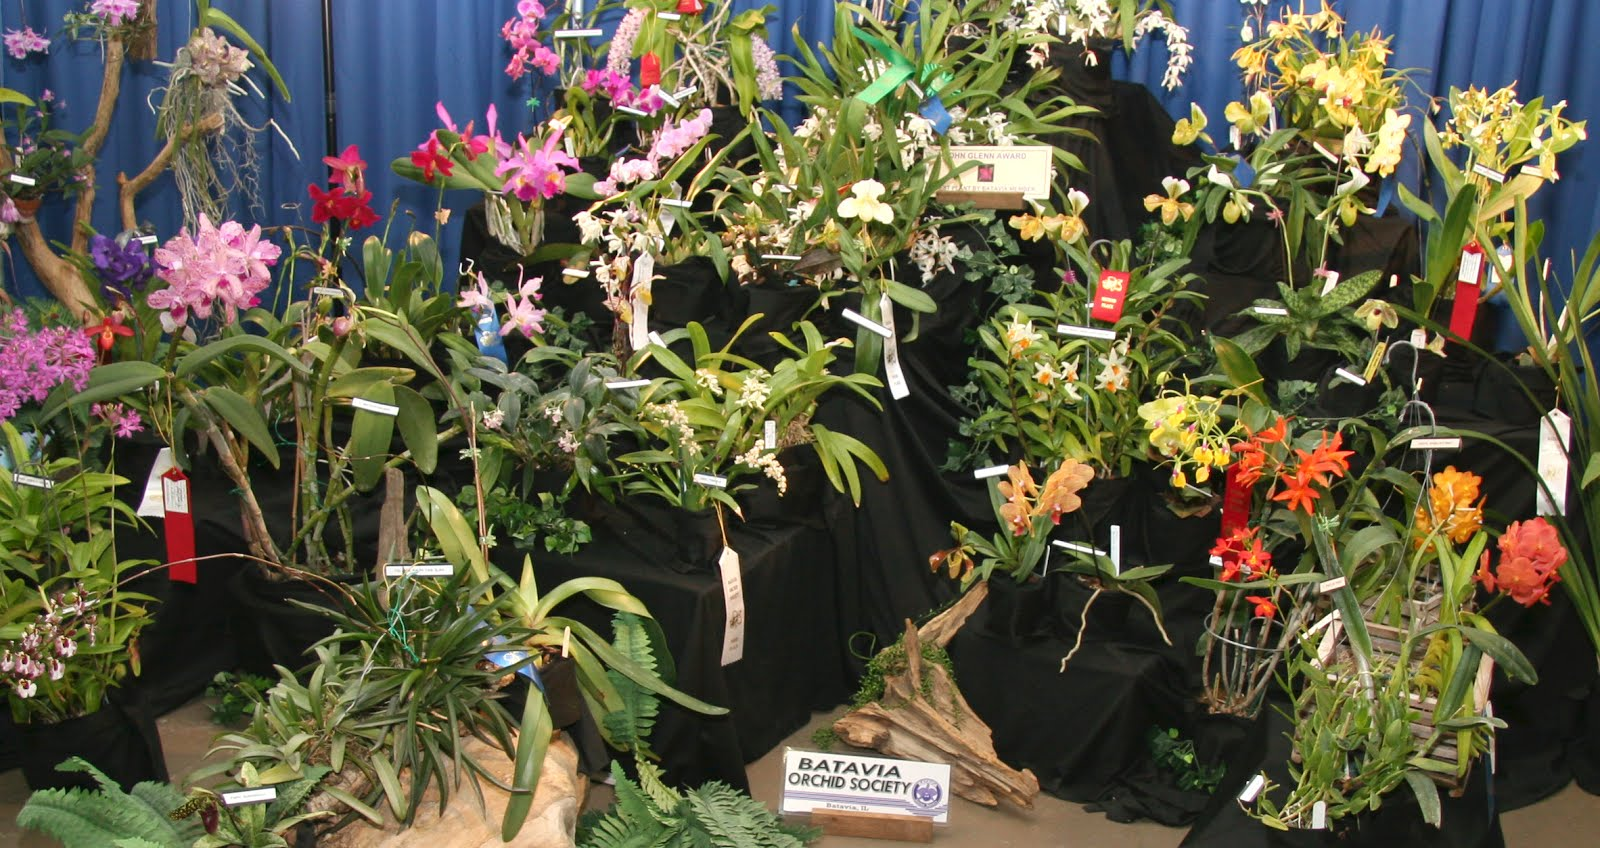 2015 Batavia Orchid Society Exhibit (www.bataviaorchidsociety.org)